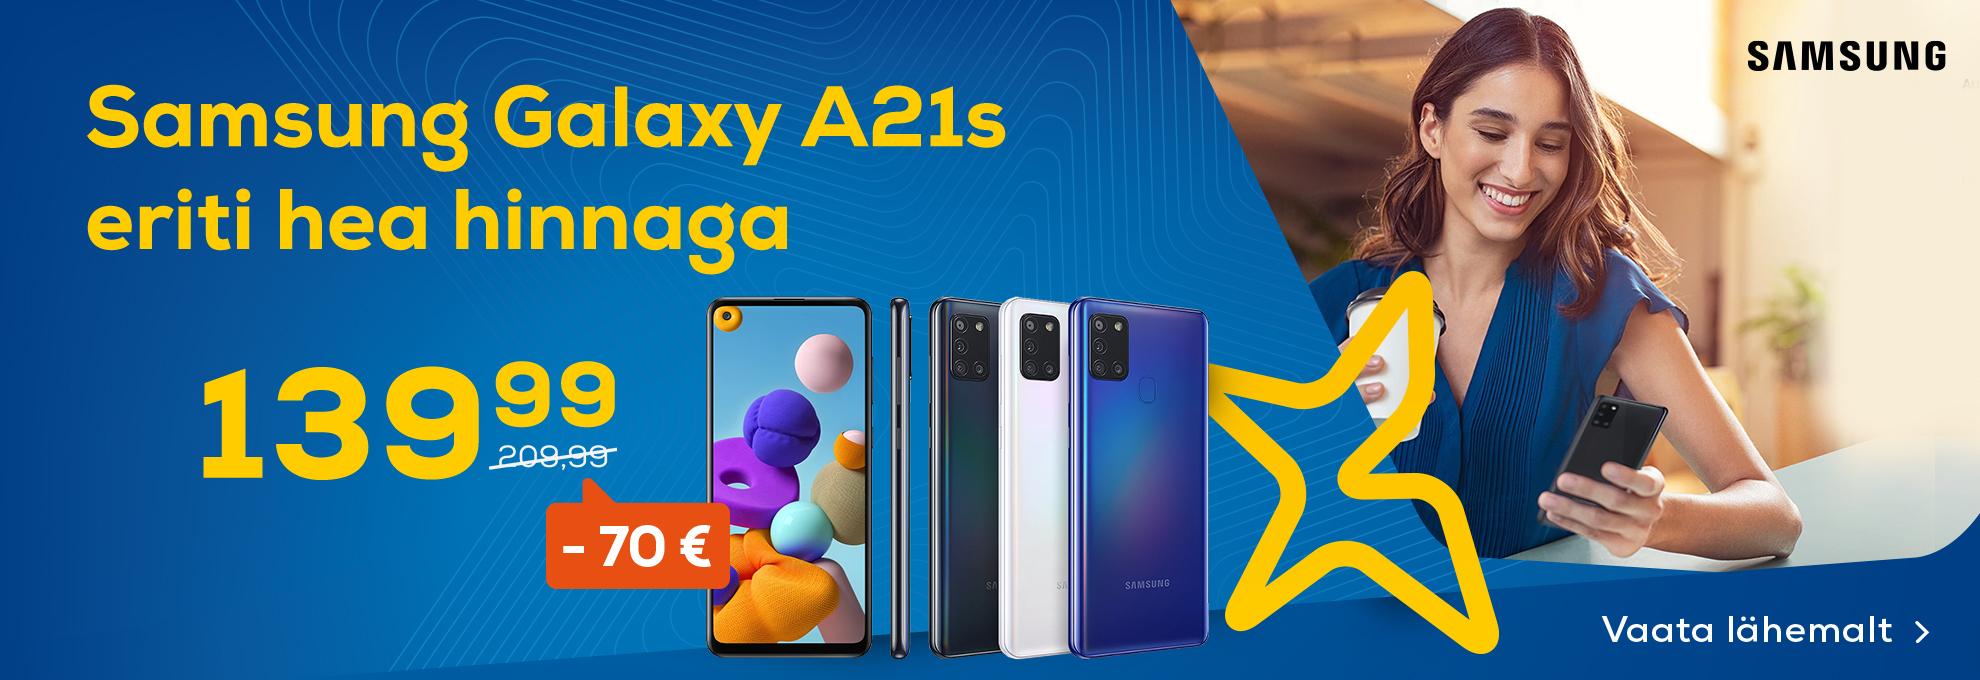 Samsung nutitelefon Galaxy A21s